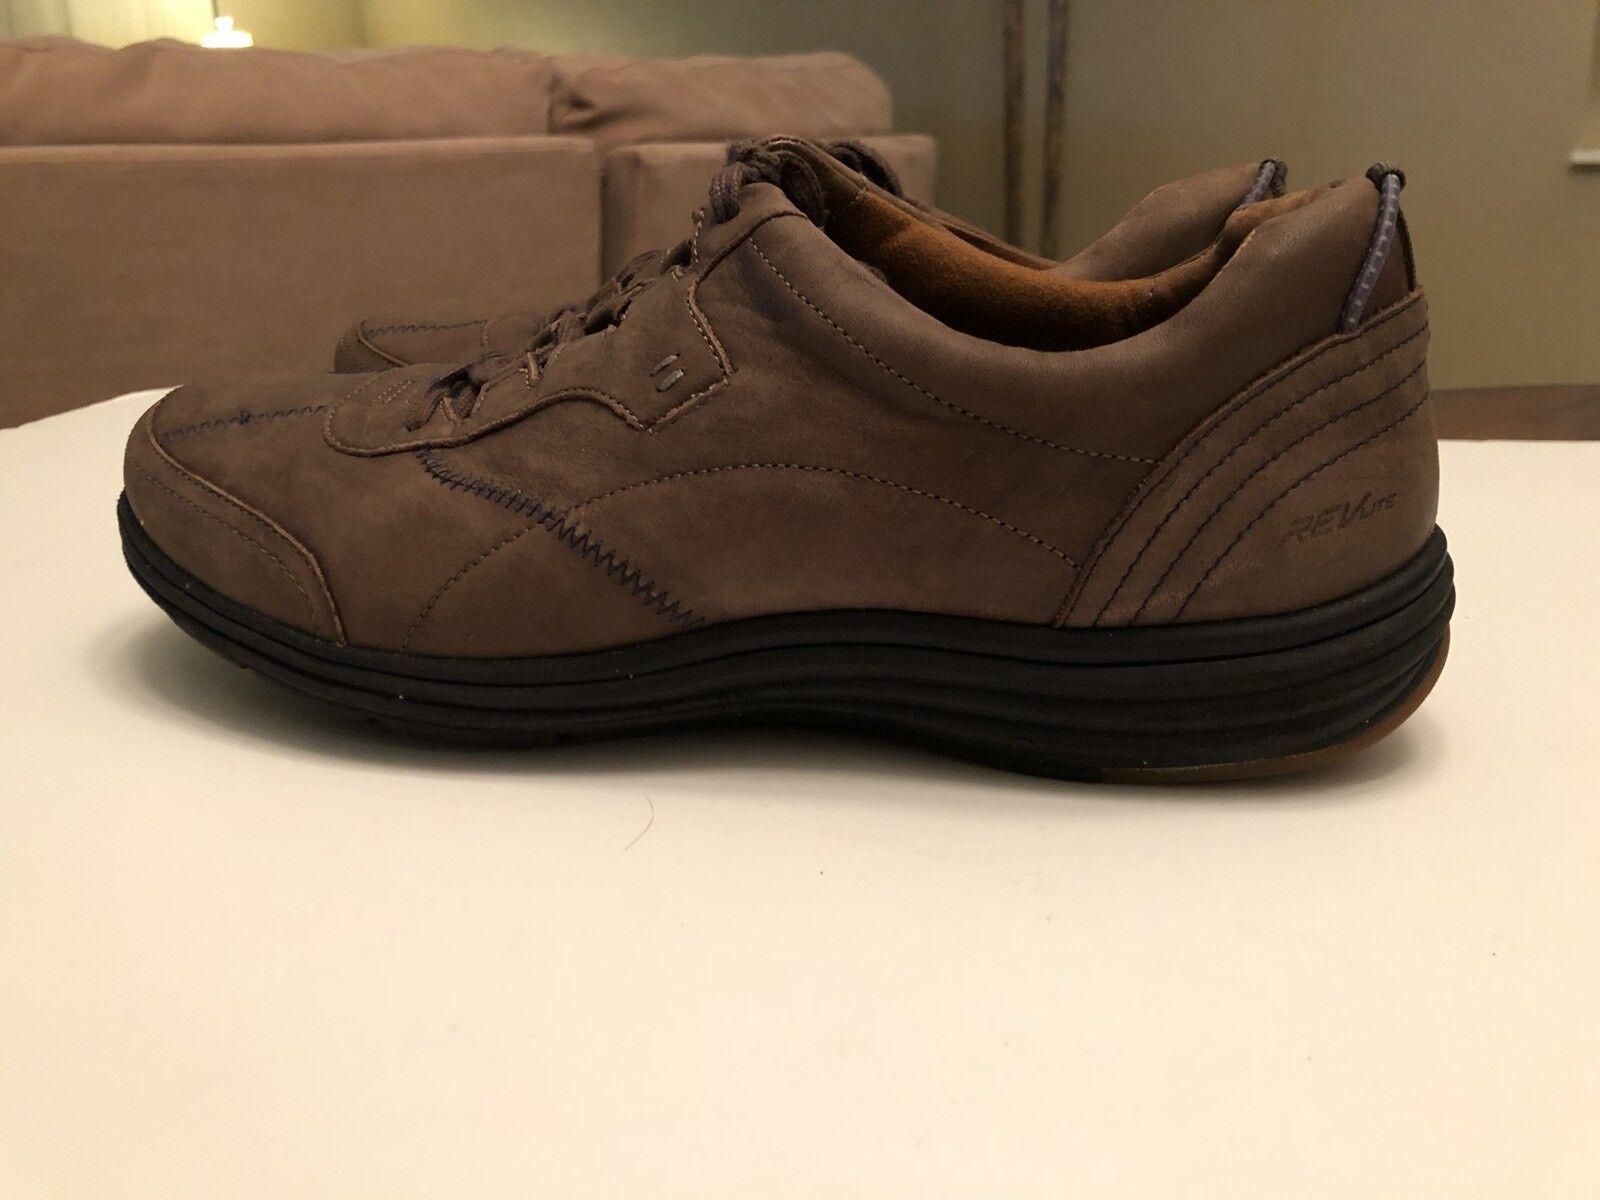 Cobb Hill REVLite NEUbalance Braun Leder Lace Up Damenschuhe Schuhes Sz 11